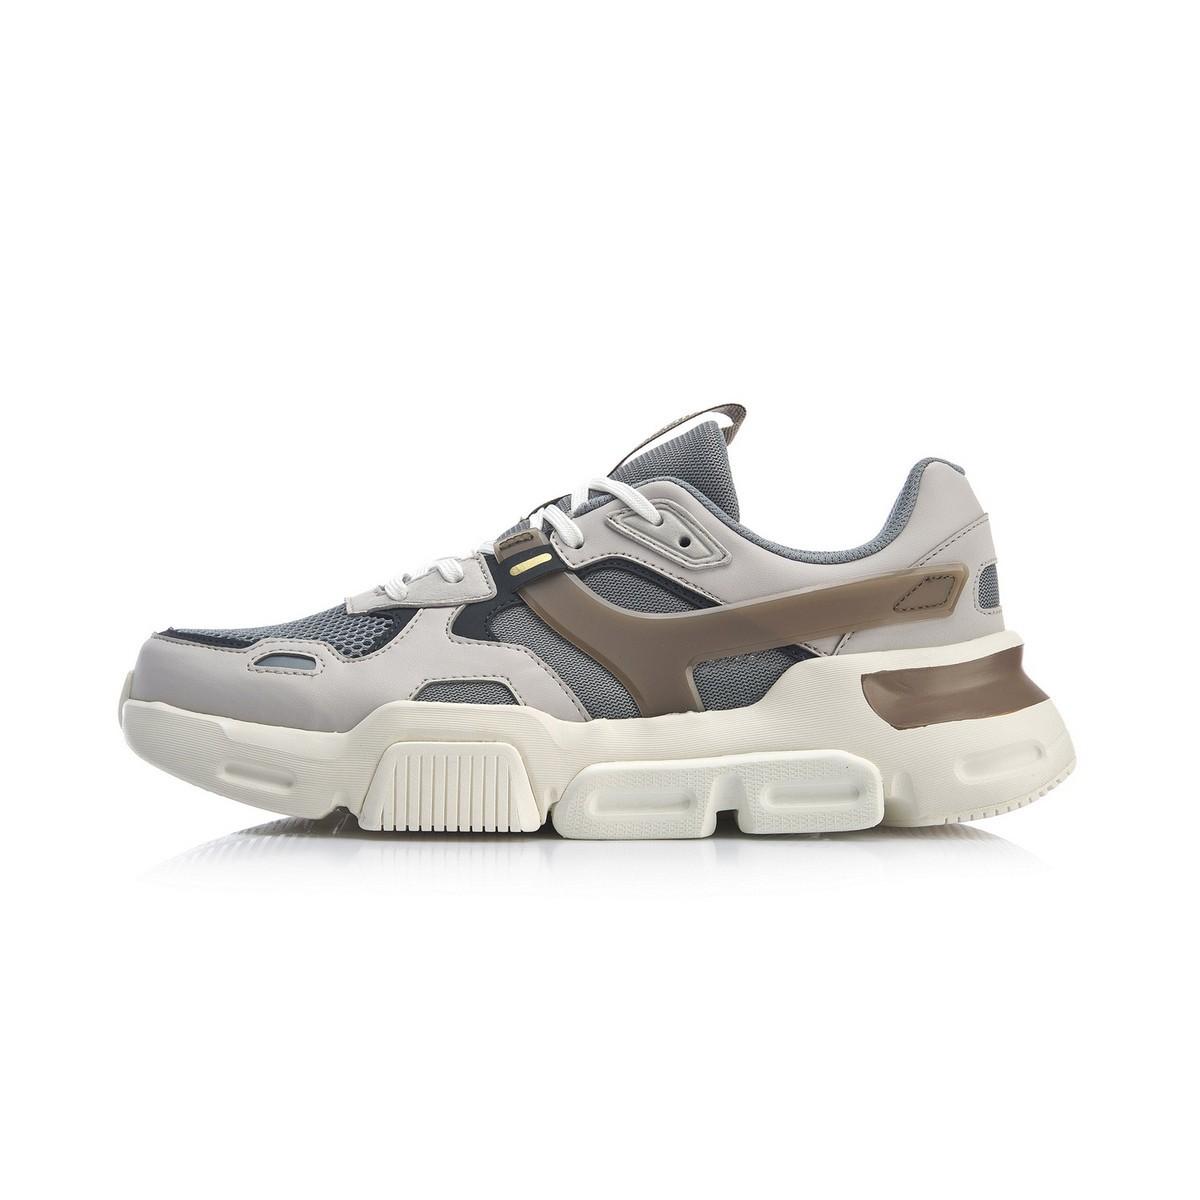 LI-NING 李宁 心选MARK 男子休闲运动鞋 AGLP039-2  灰白 42